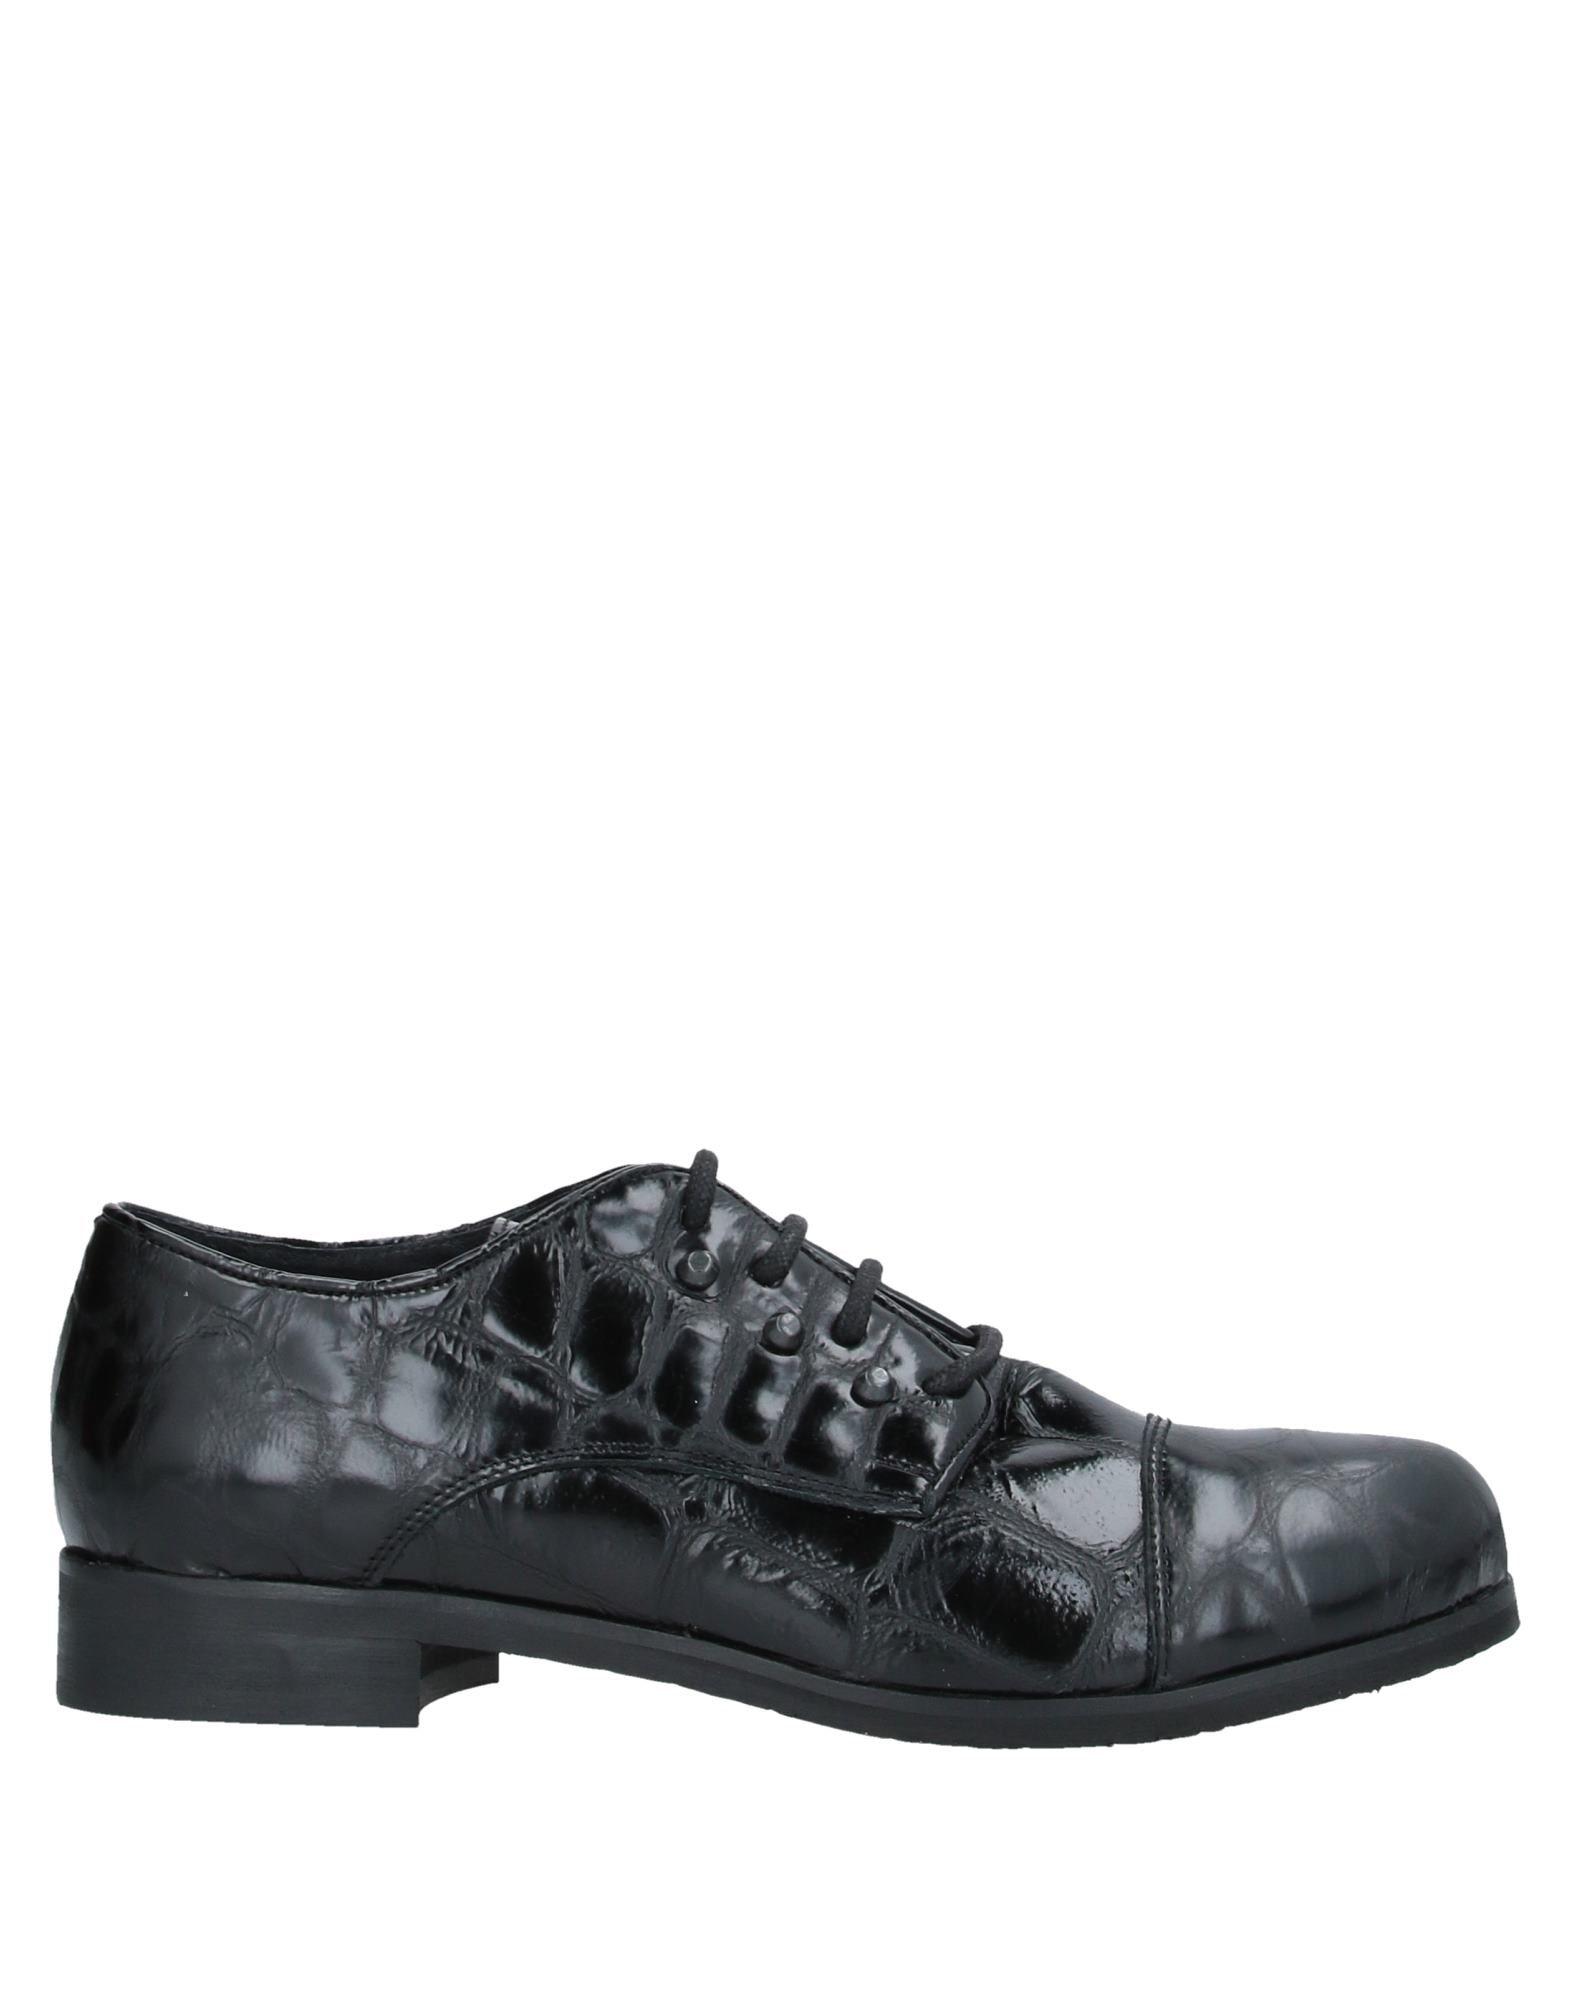 GFG CREAZIONI Обувь на шнурках ремень marina creazioni